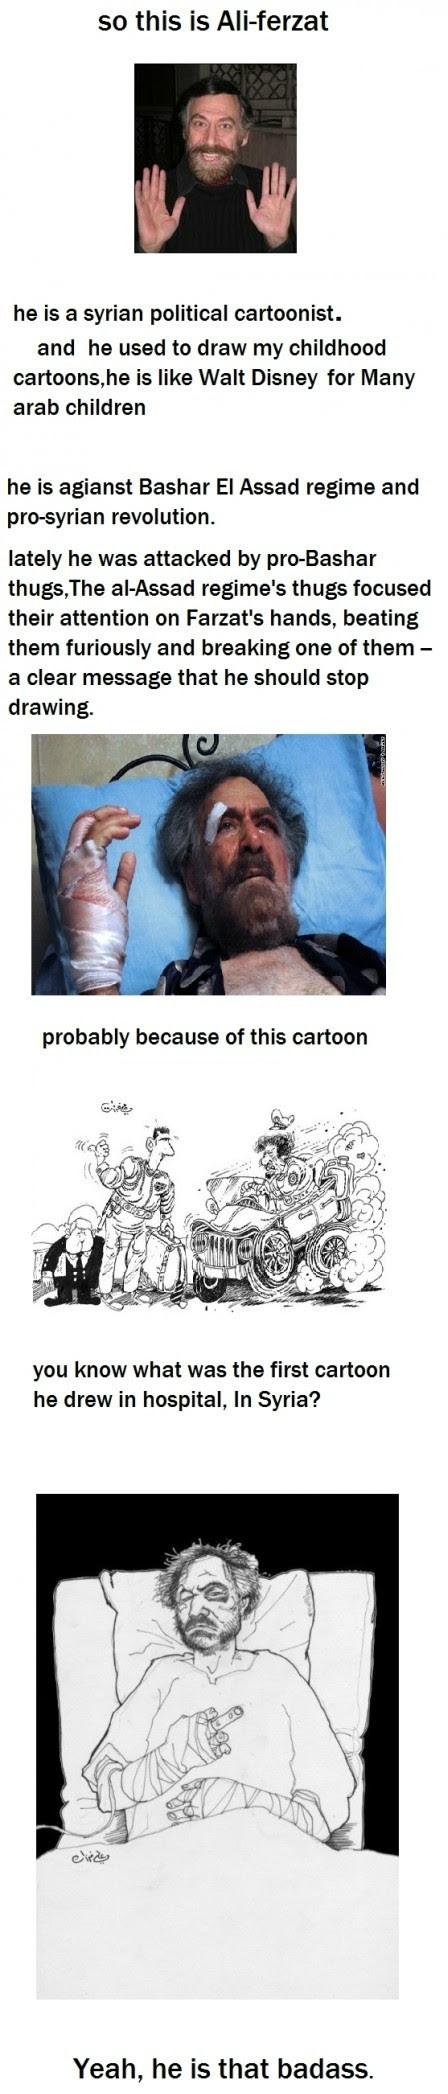 The Tale Of Syrian Cartoonist Ali Ferzat